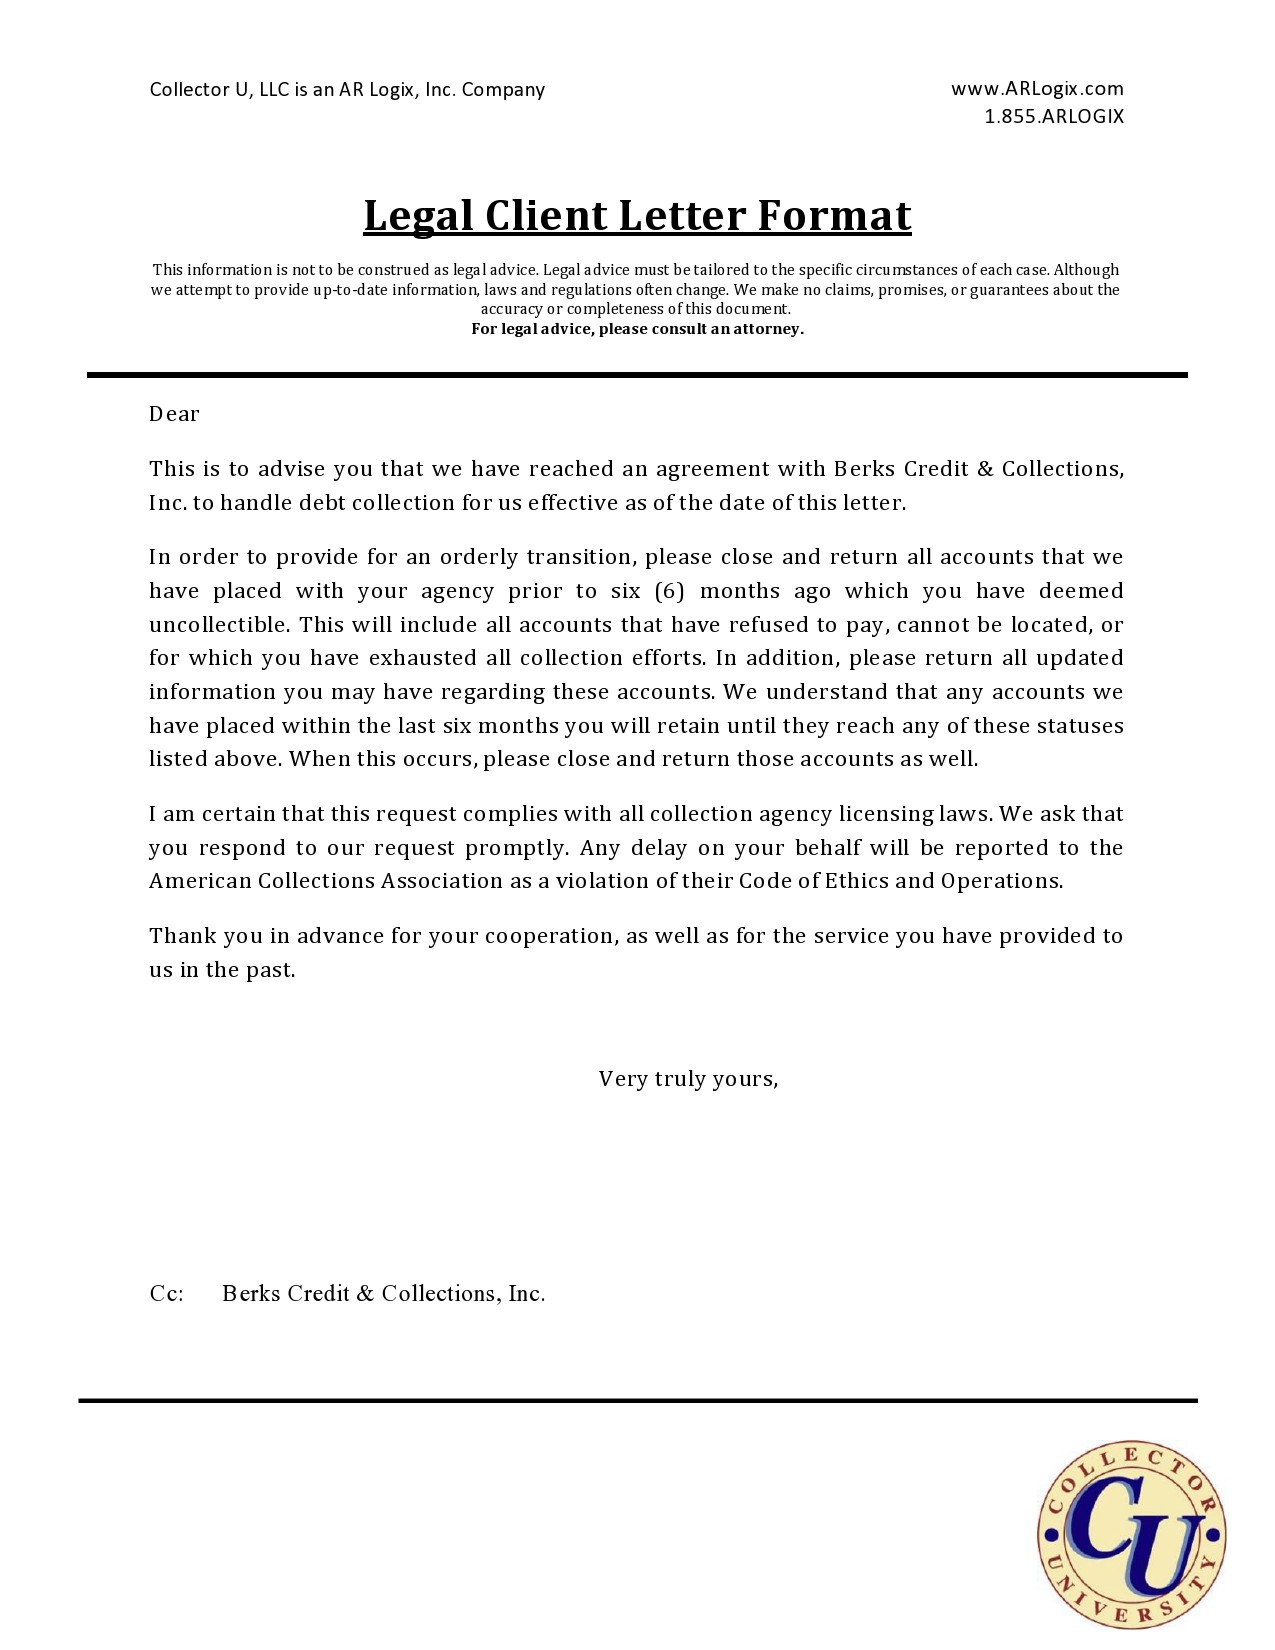 Free legal letter format 07